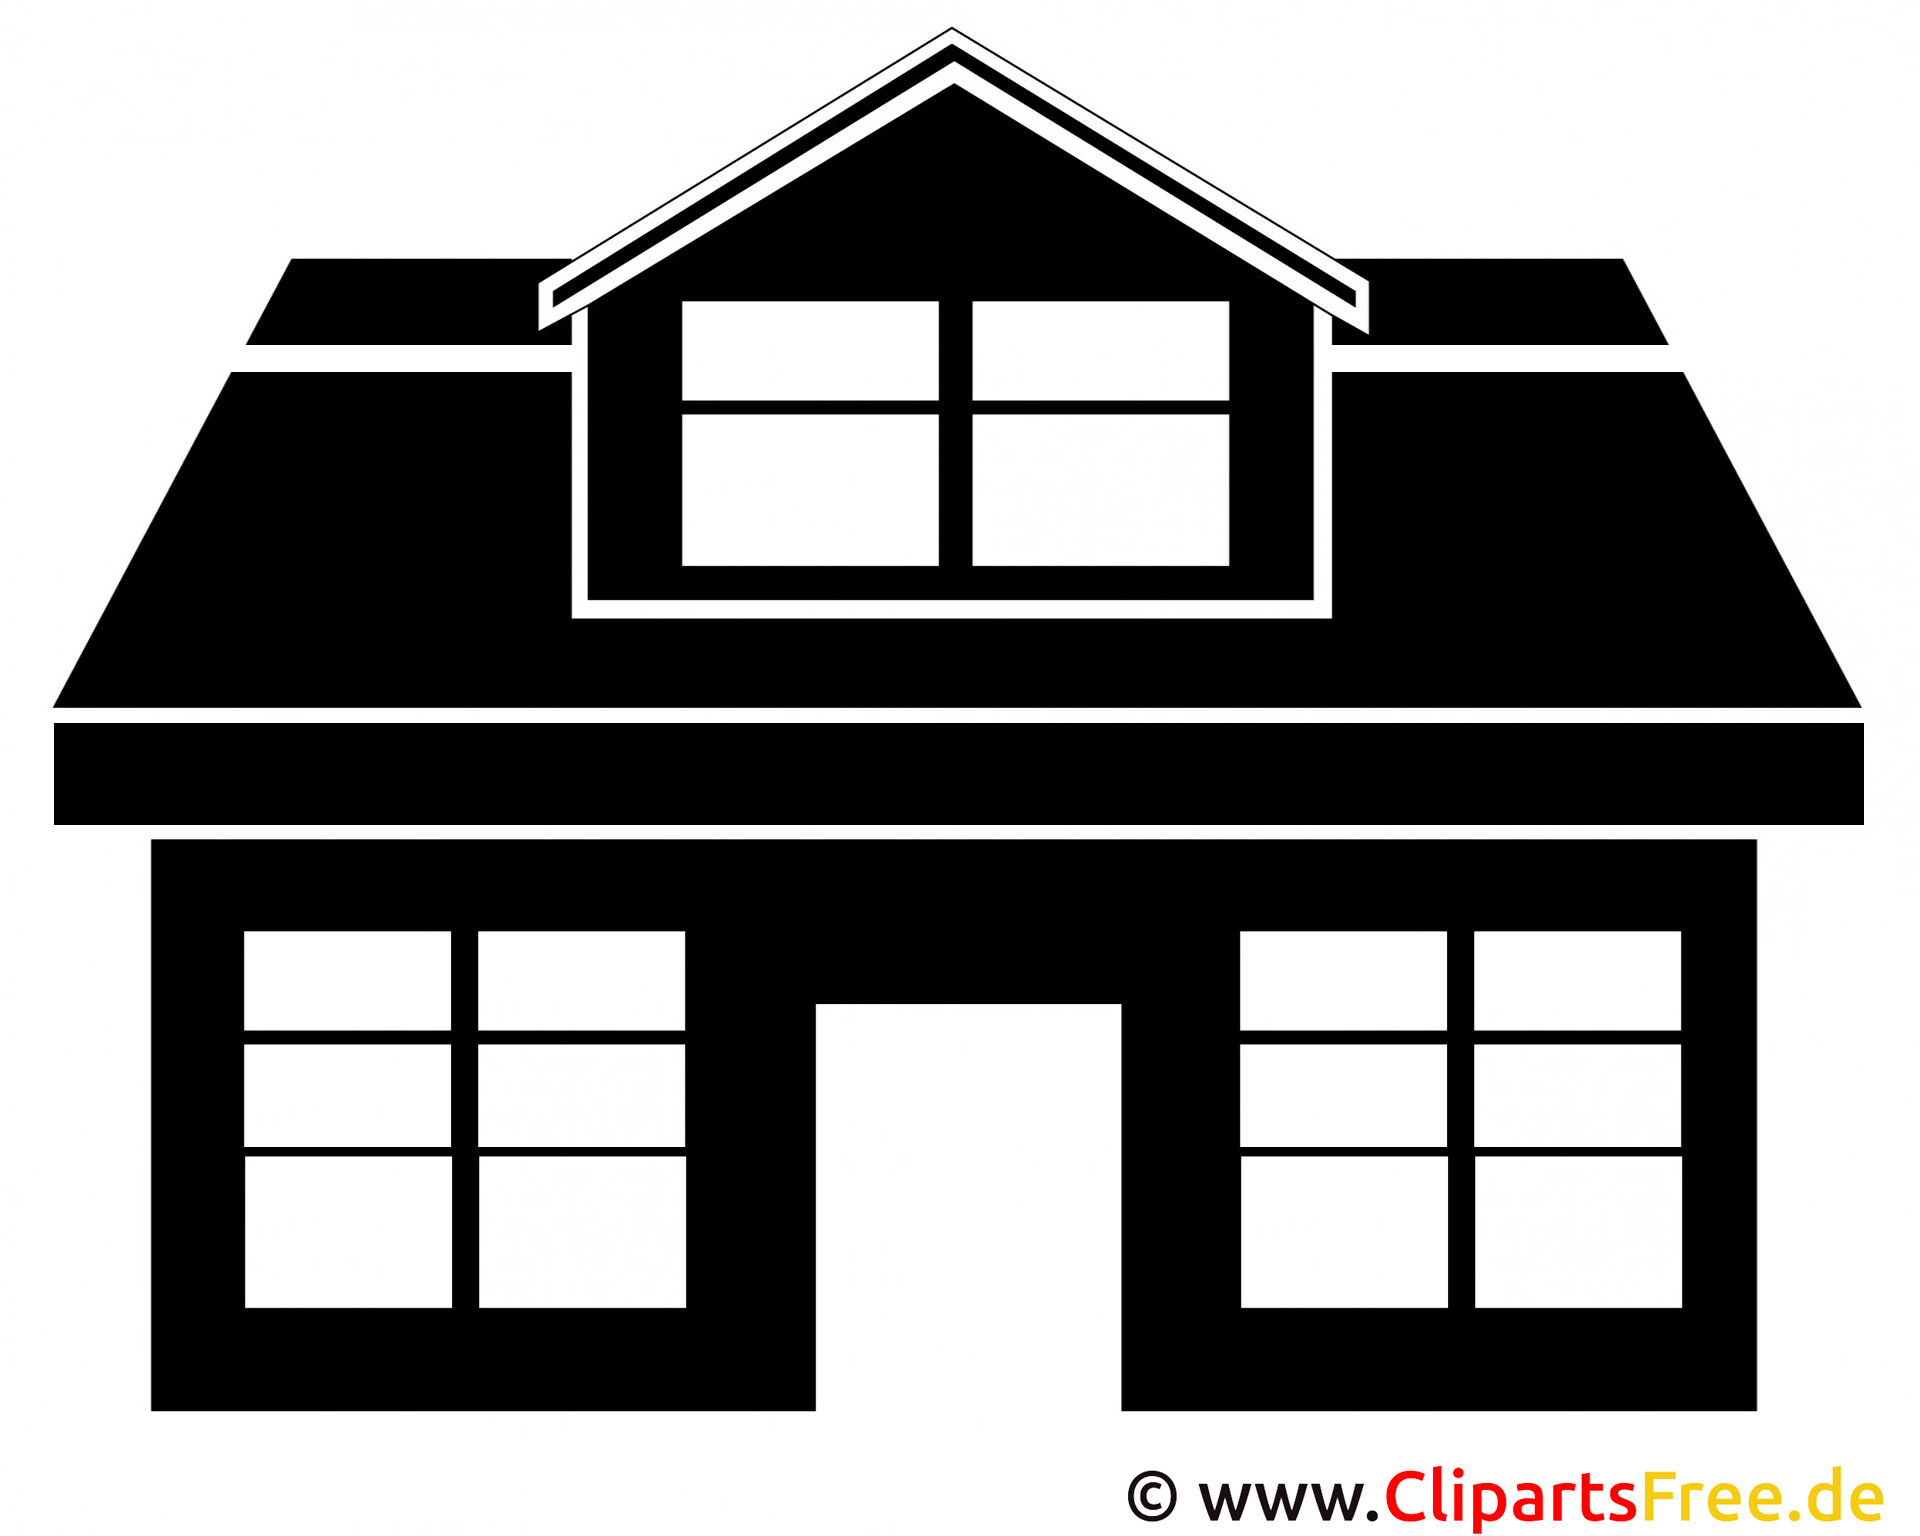 Haus Silhouette Clipart